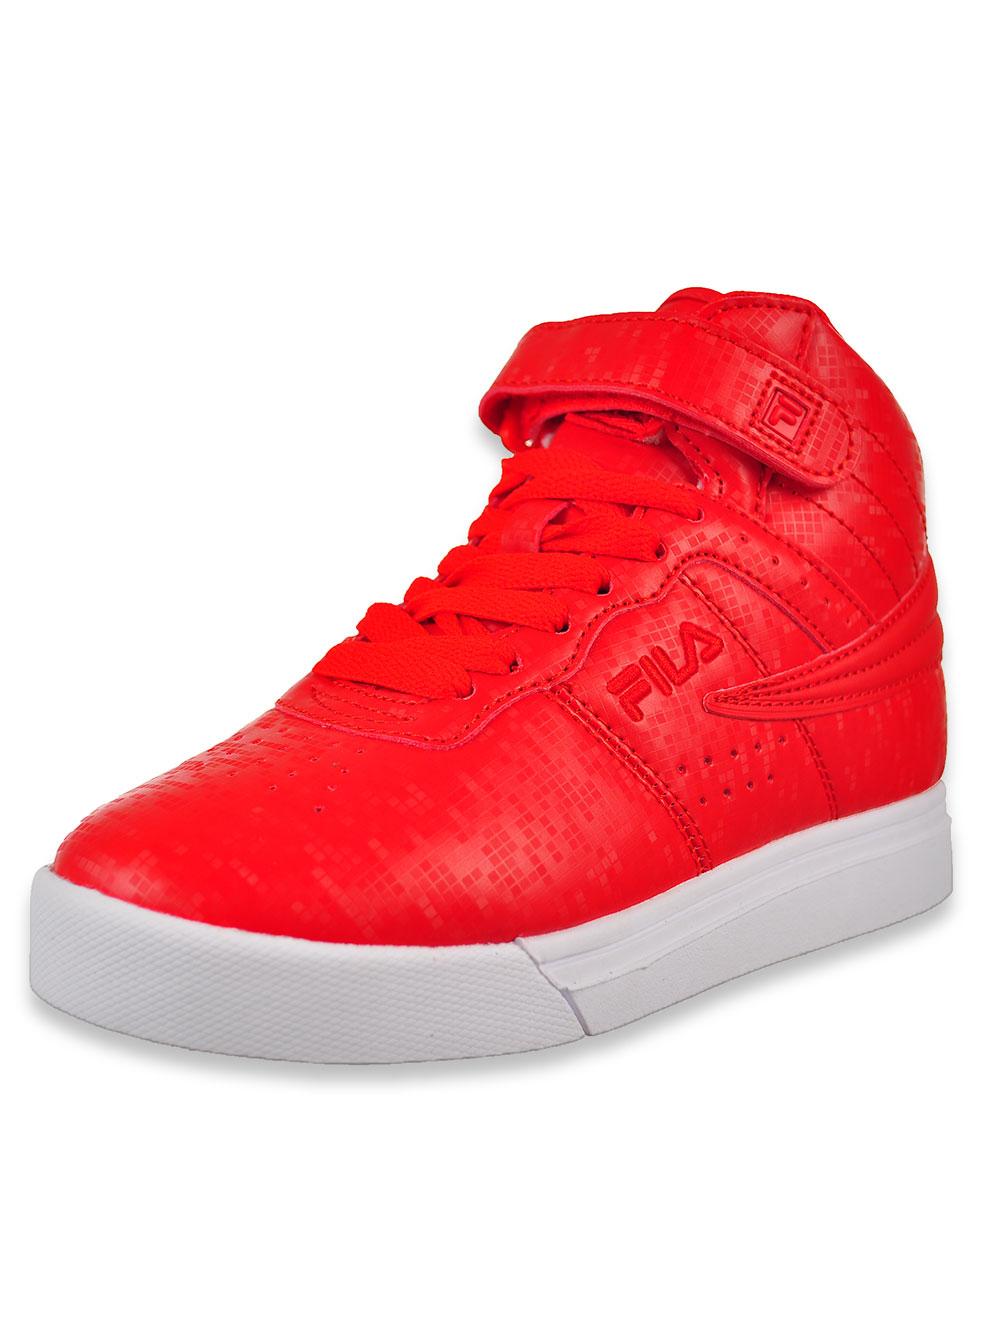 Fila Boys' VULC 13 Digital Hi Top Sneakers (Sizes 11 – 7)